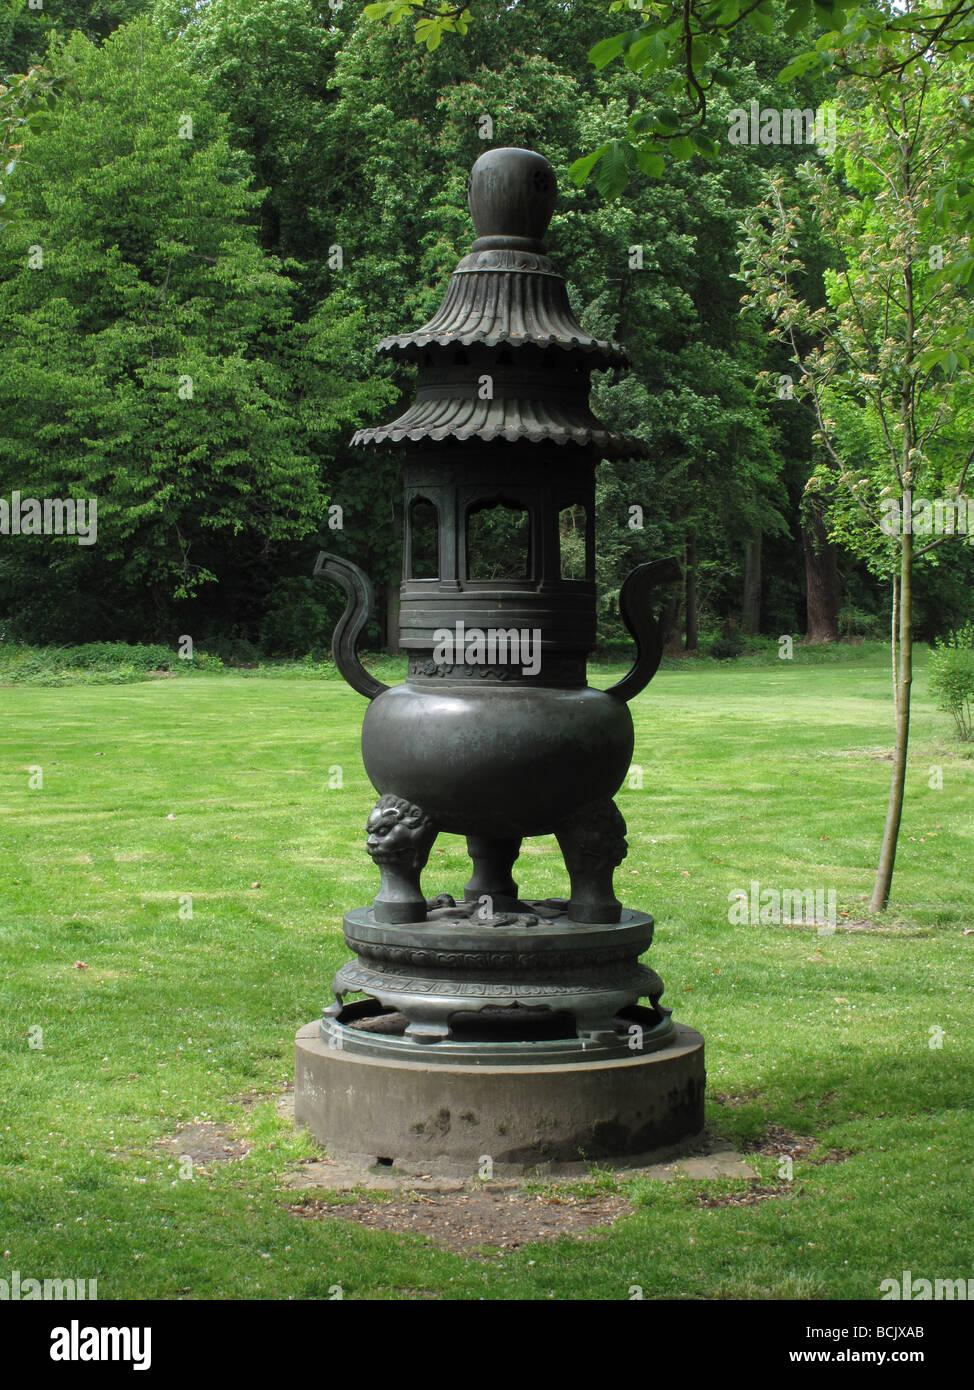 Germany Berlin Sanssouci park in Potsdam a bronze incense burner - Stock Image